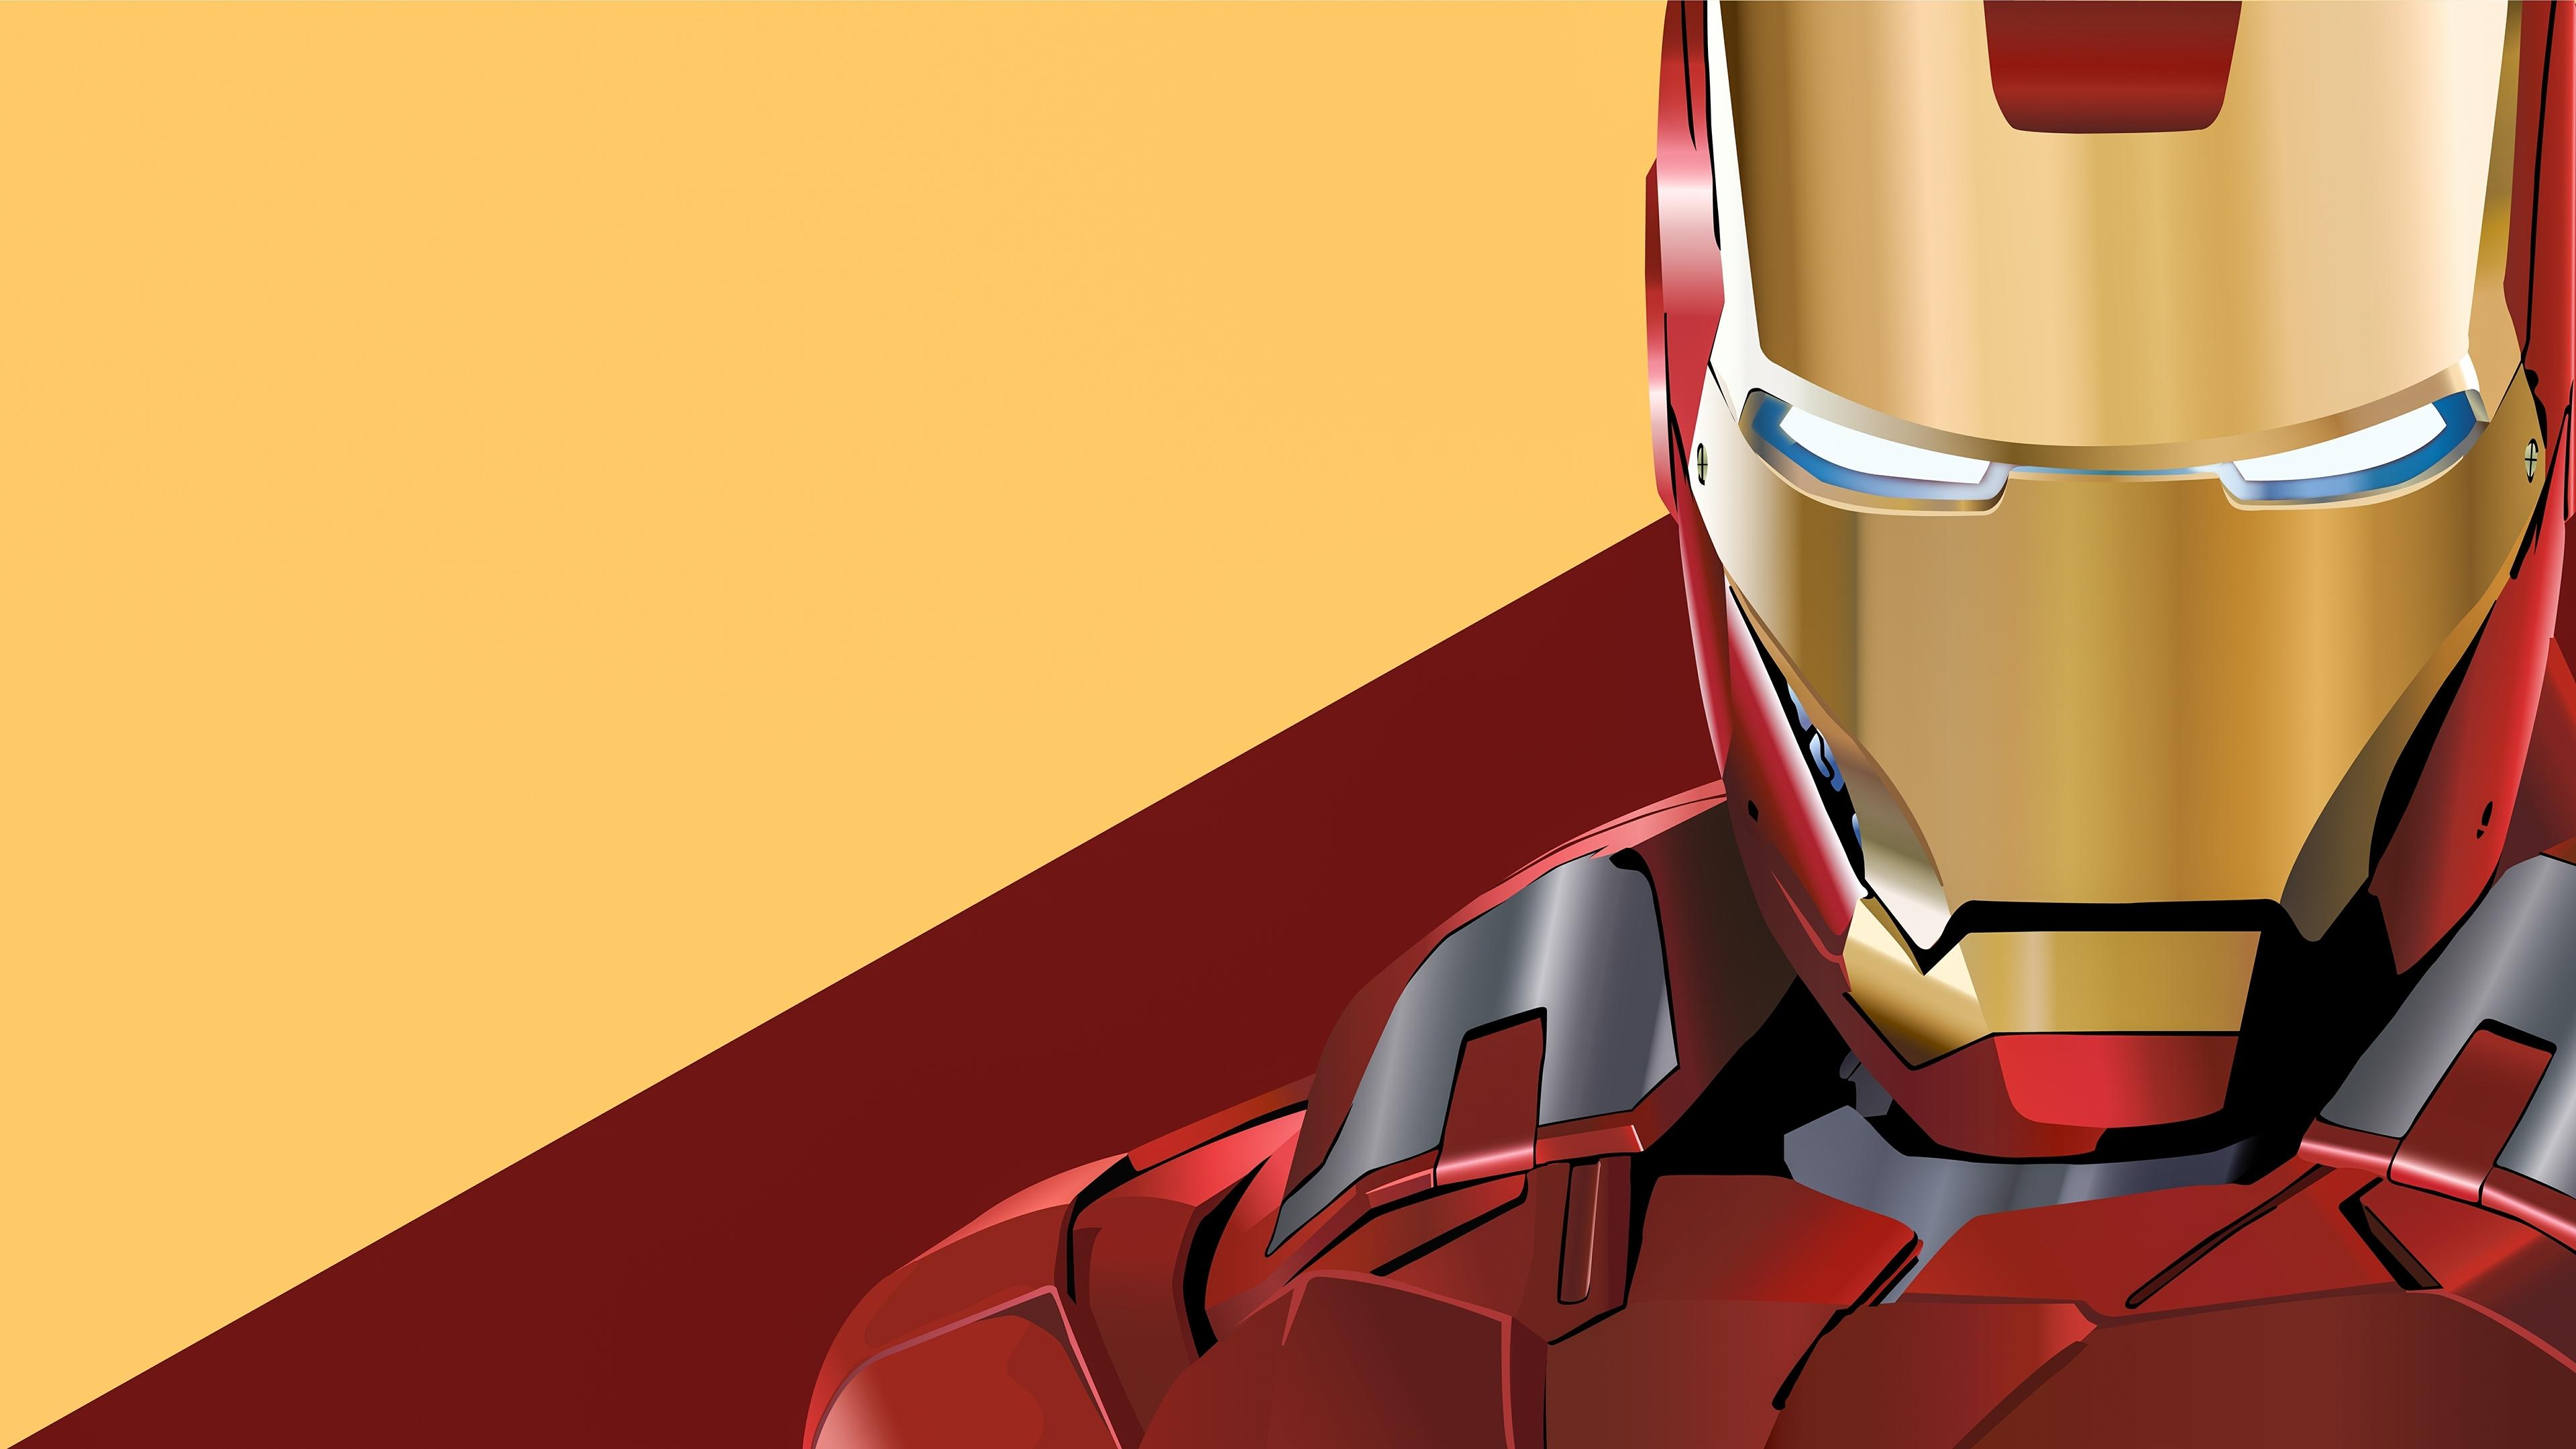 iron man digital artwork 4k v0